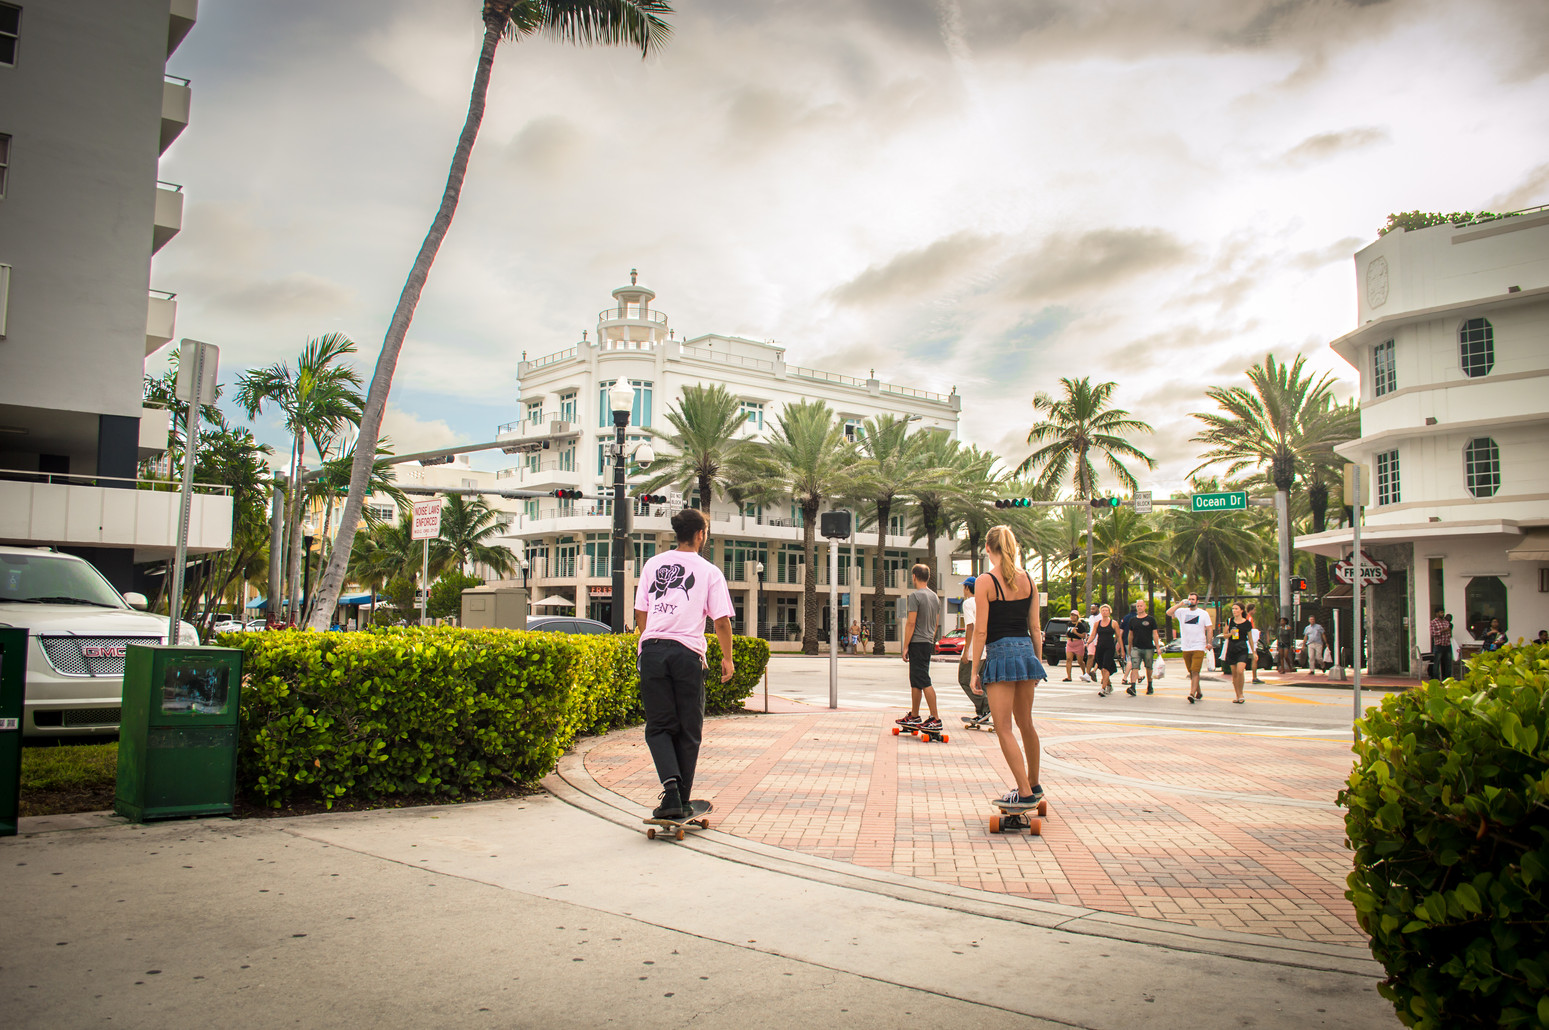 Skateboarders in South Beach, Miami